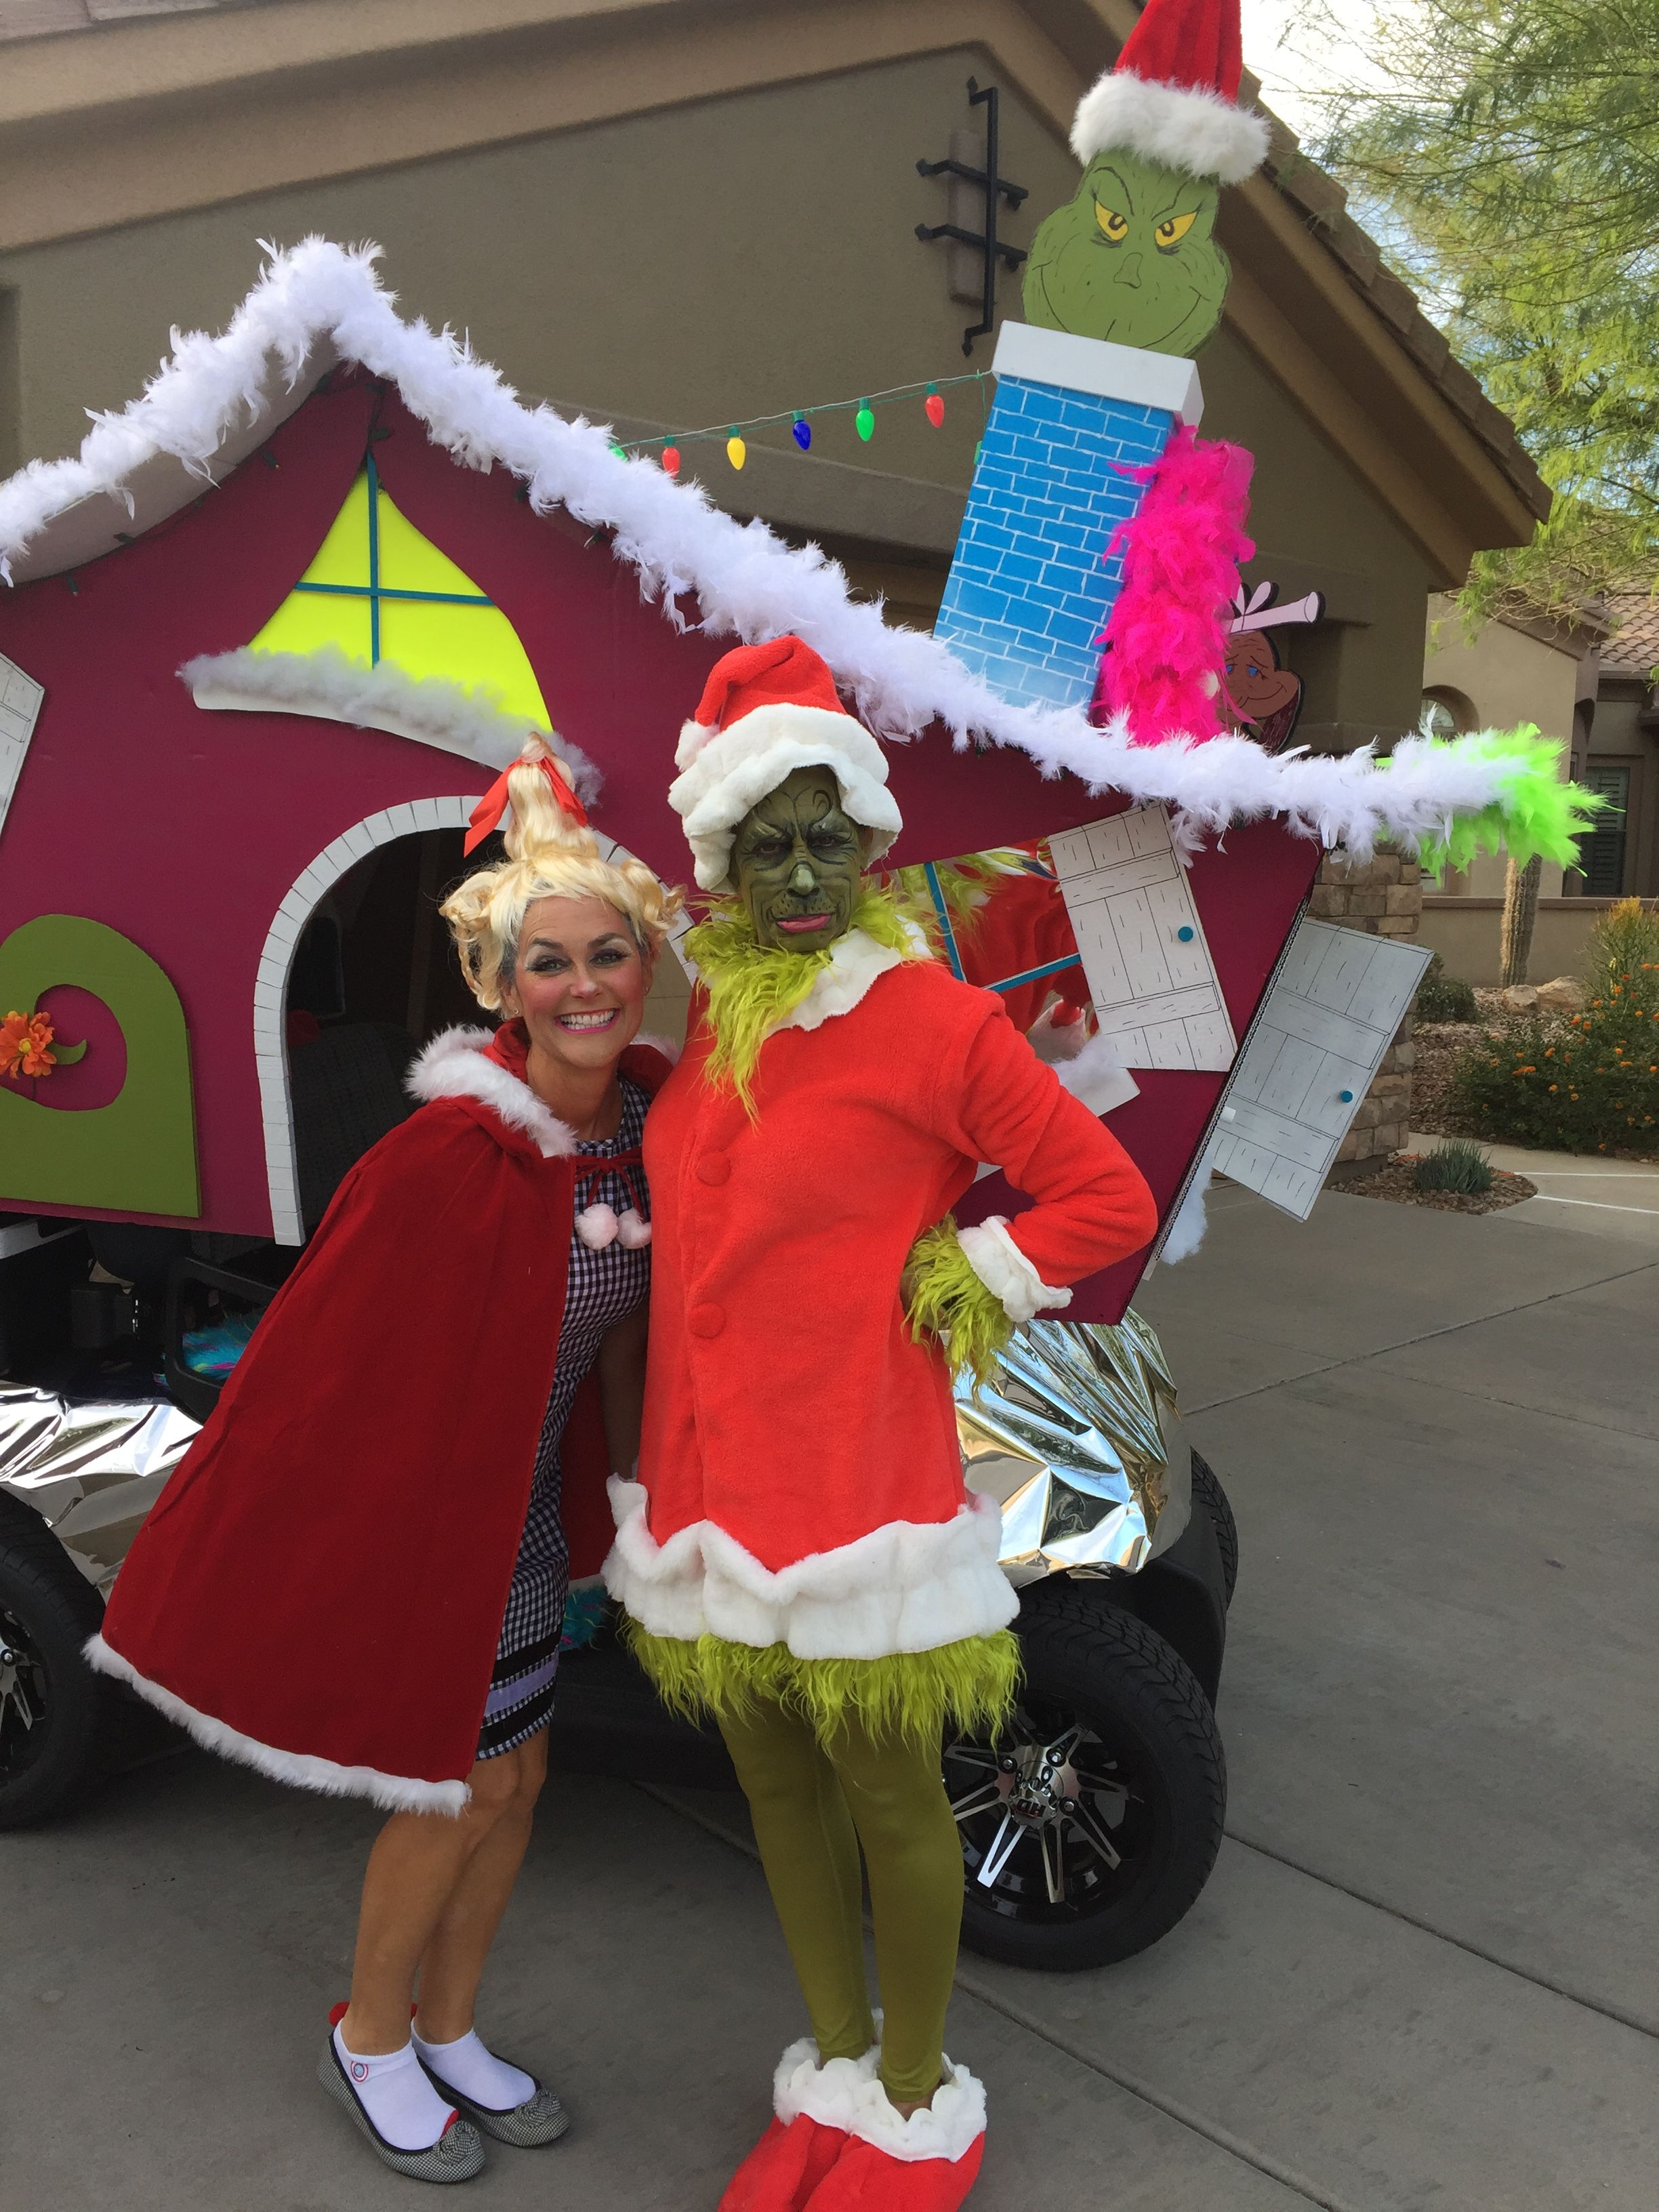 The Grinch Golf Cart Golf Cart Decorations Christmas Parade Floats Christmas Golf